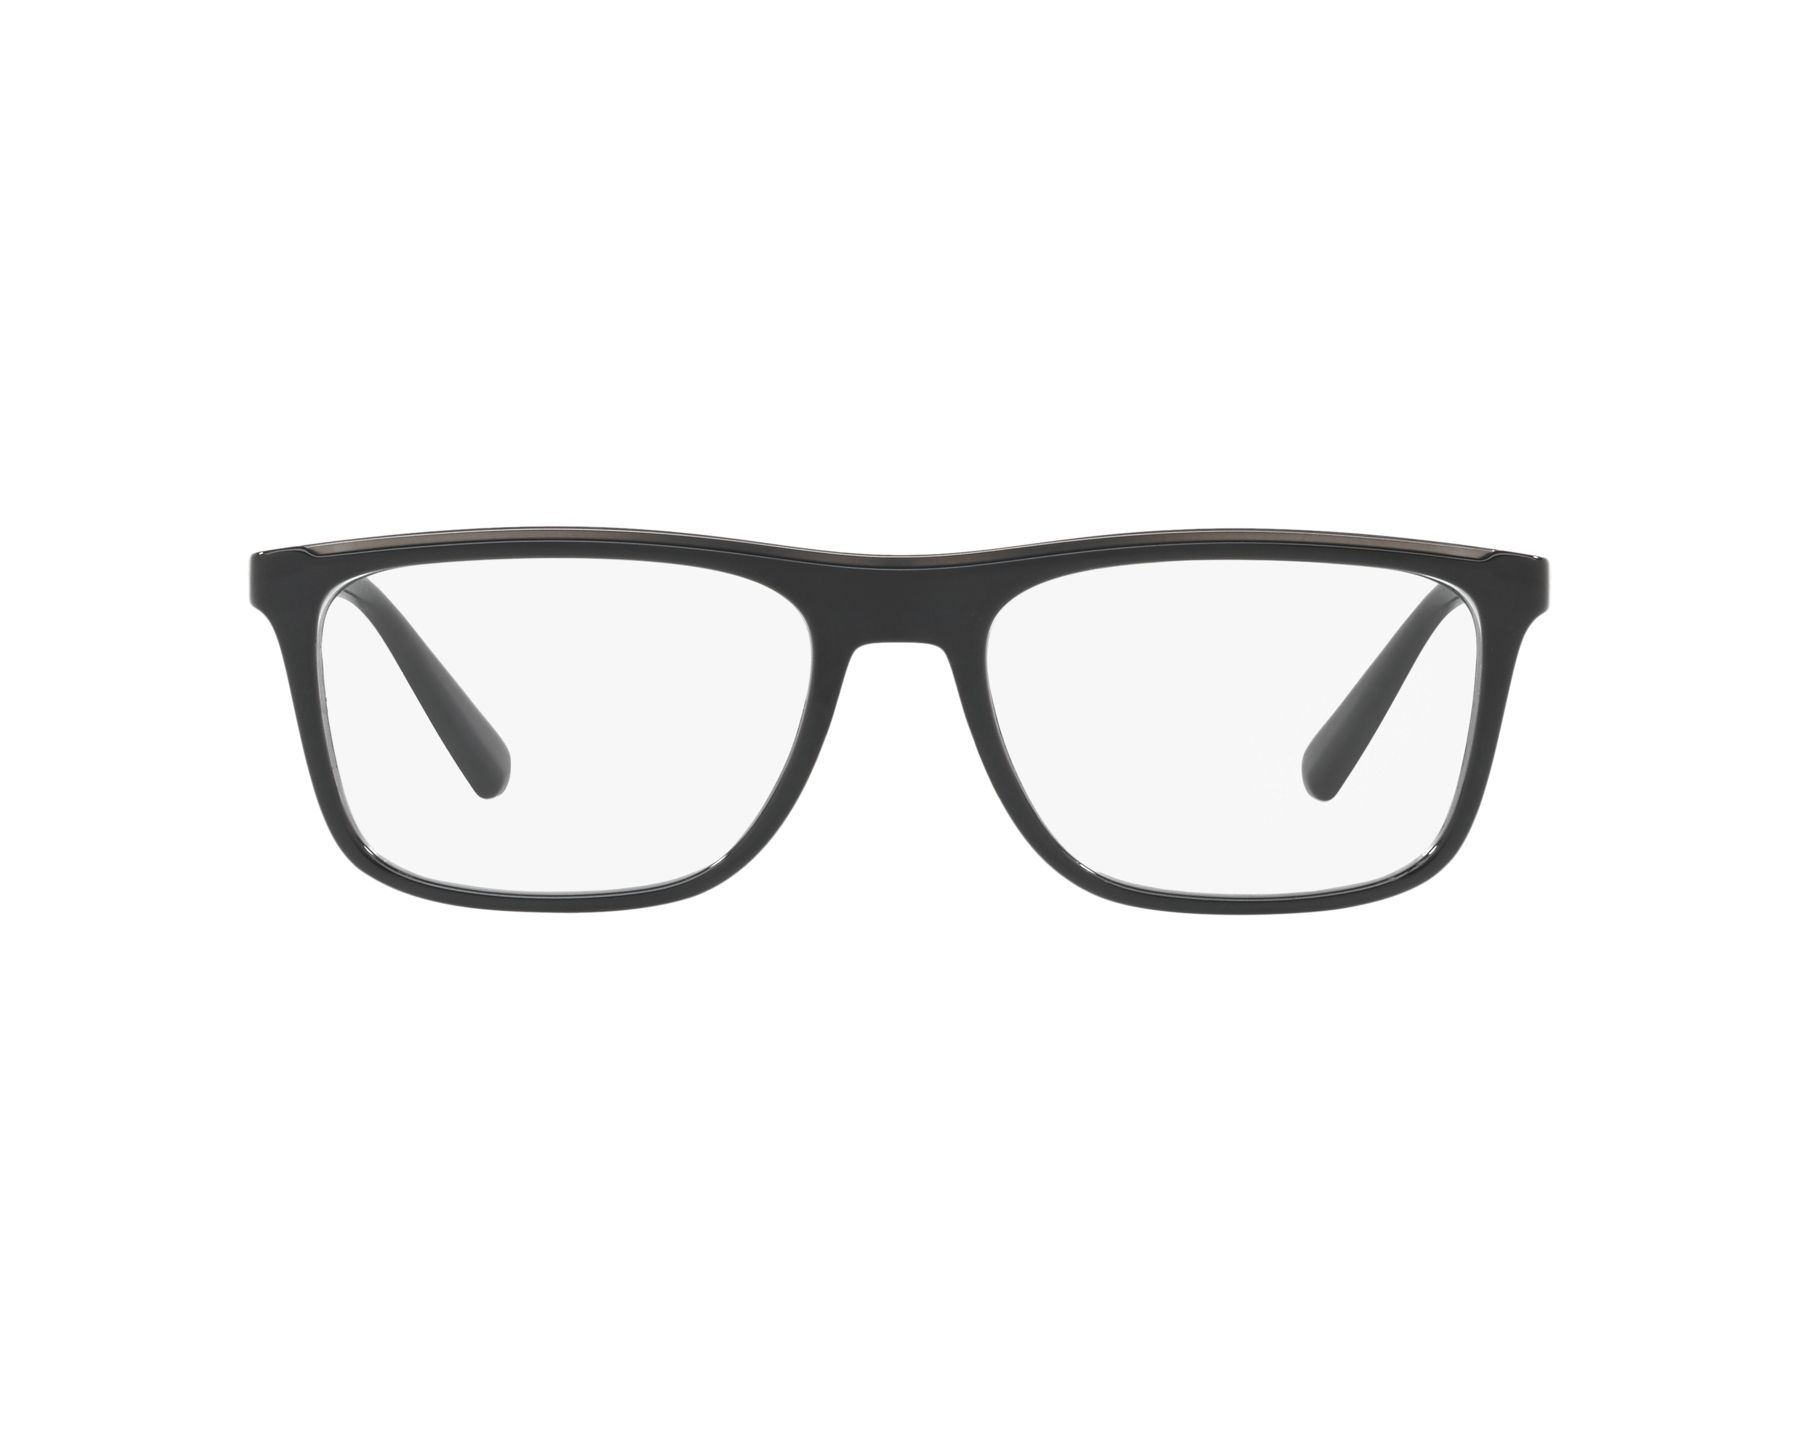 Emporio Armani Eyeglasses EA-3124 5017 Black | visio-net.com